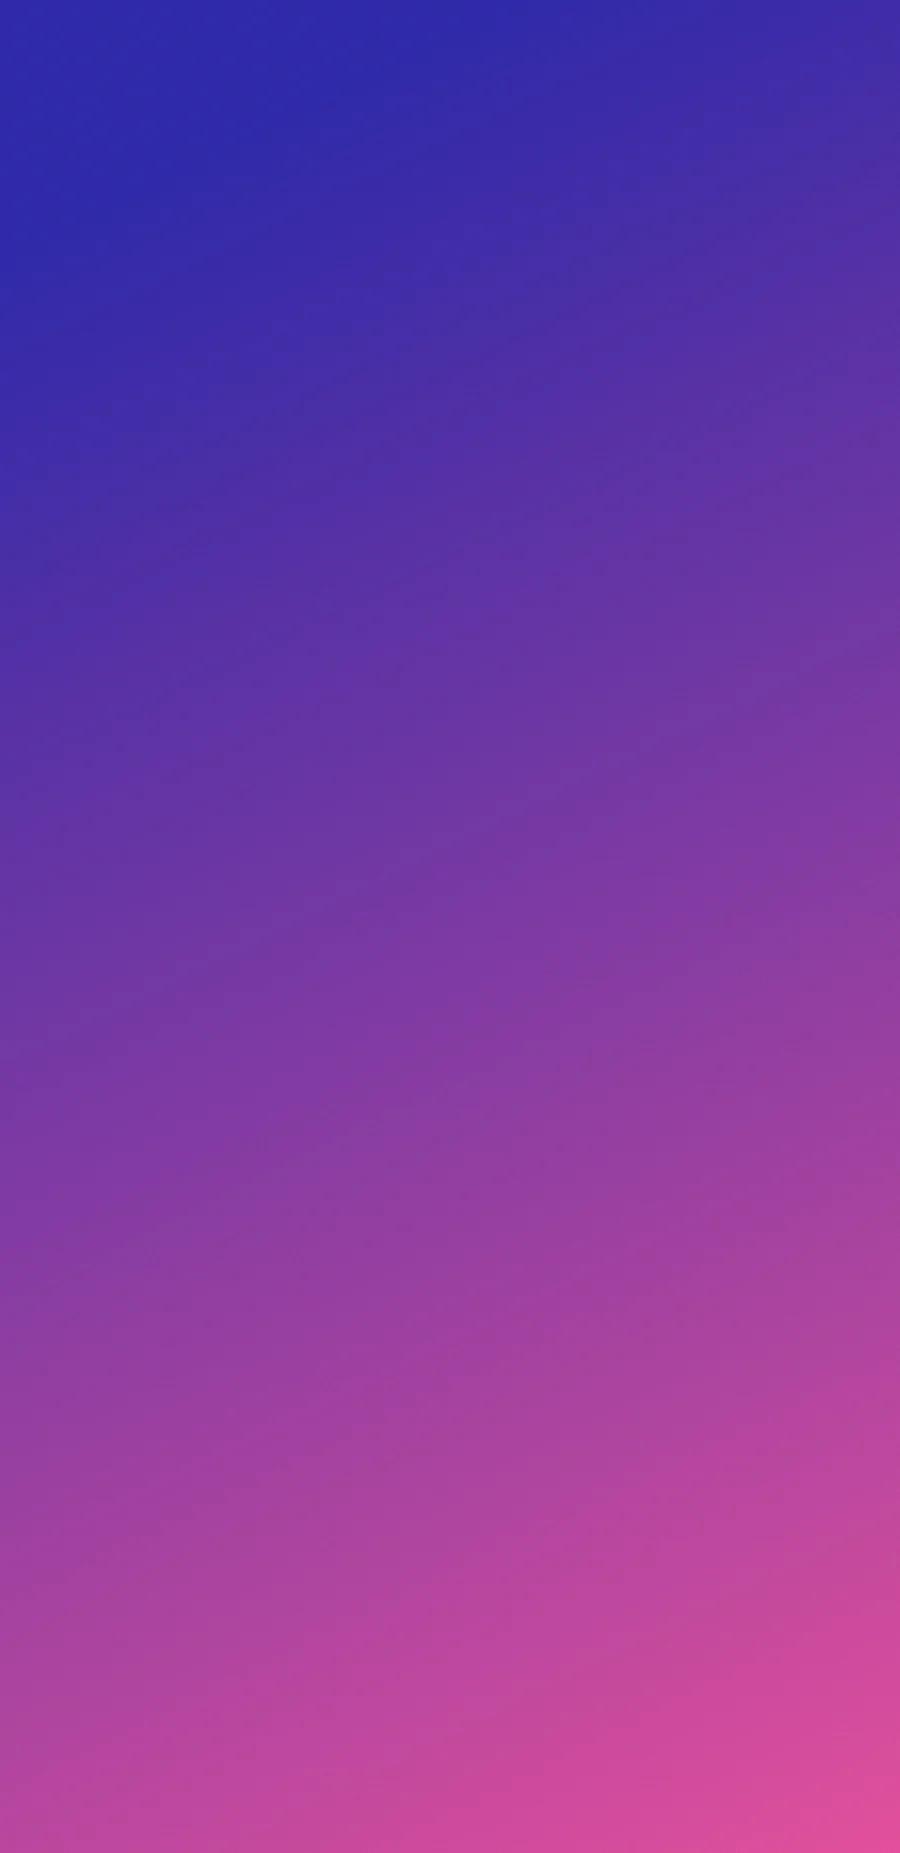 900+ Texture Background Images: Download HD Backgrounds on Unsplash